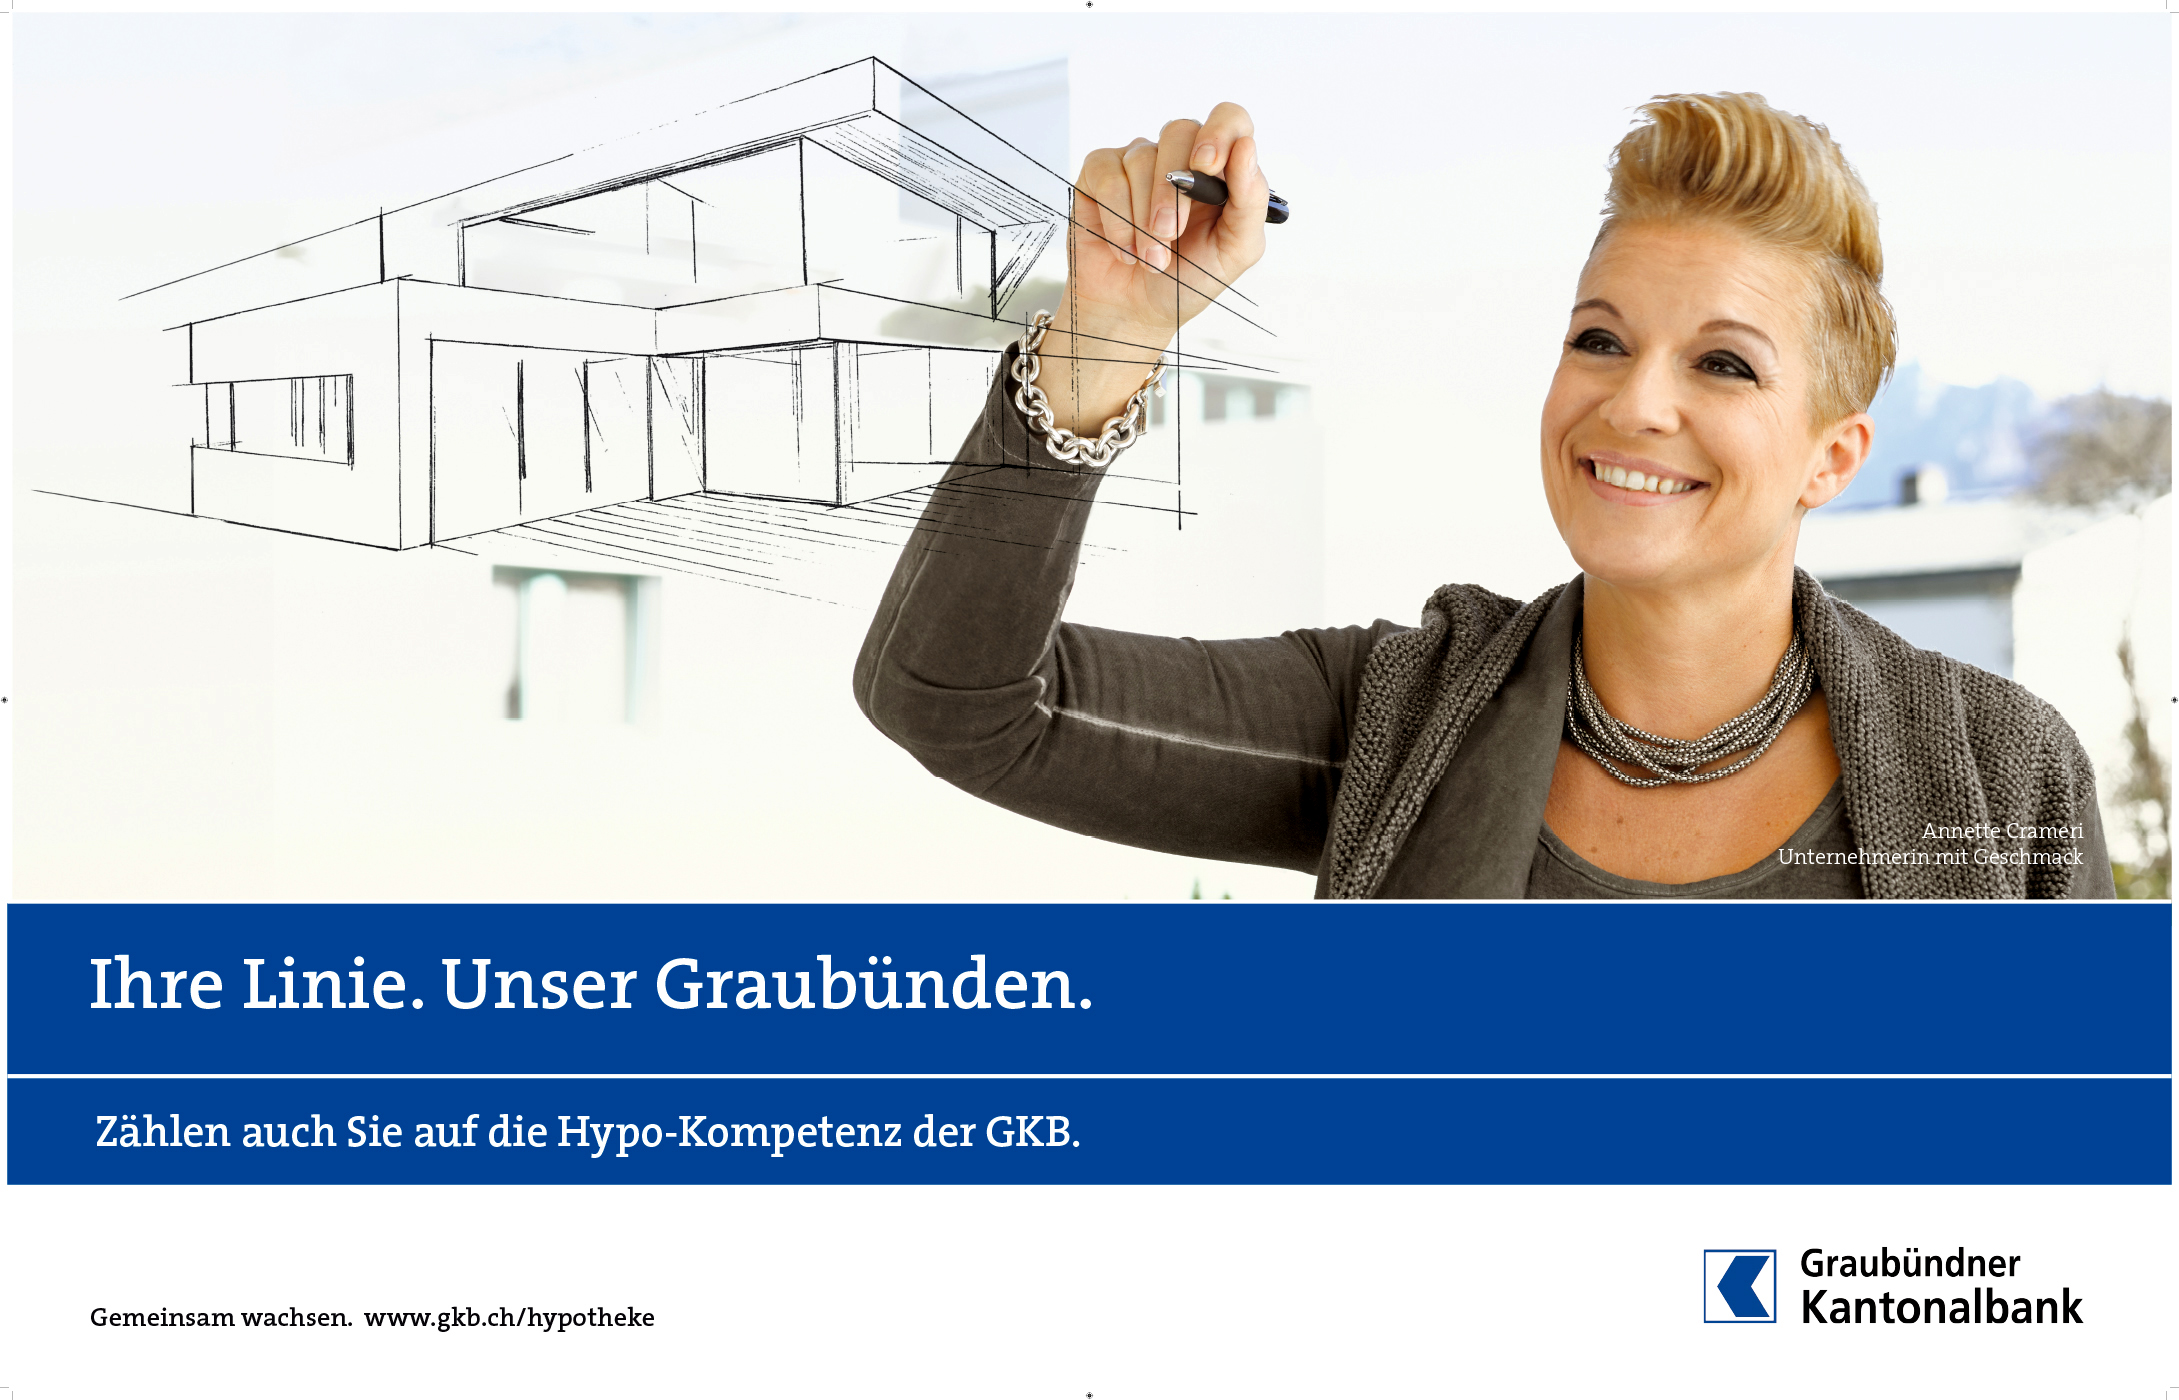 _Gkb_Universalkampagne_GzA2-2_0.jpg